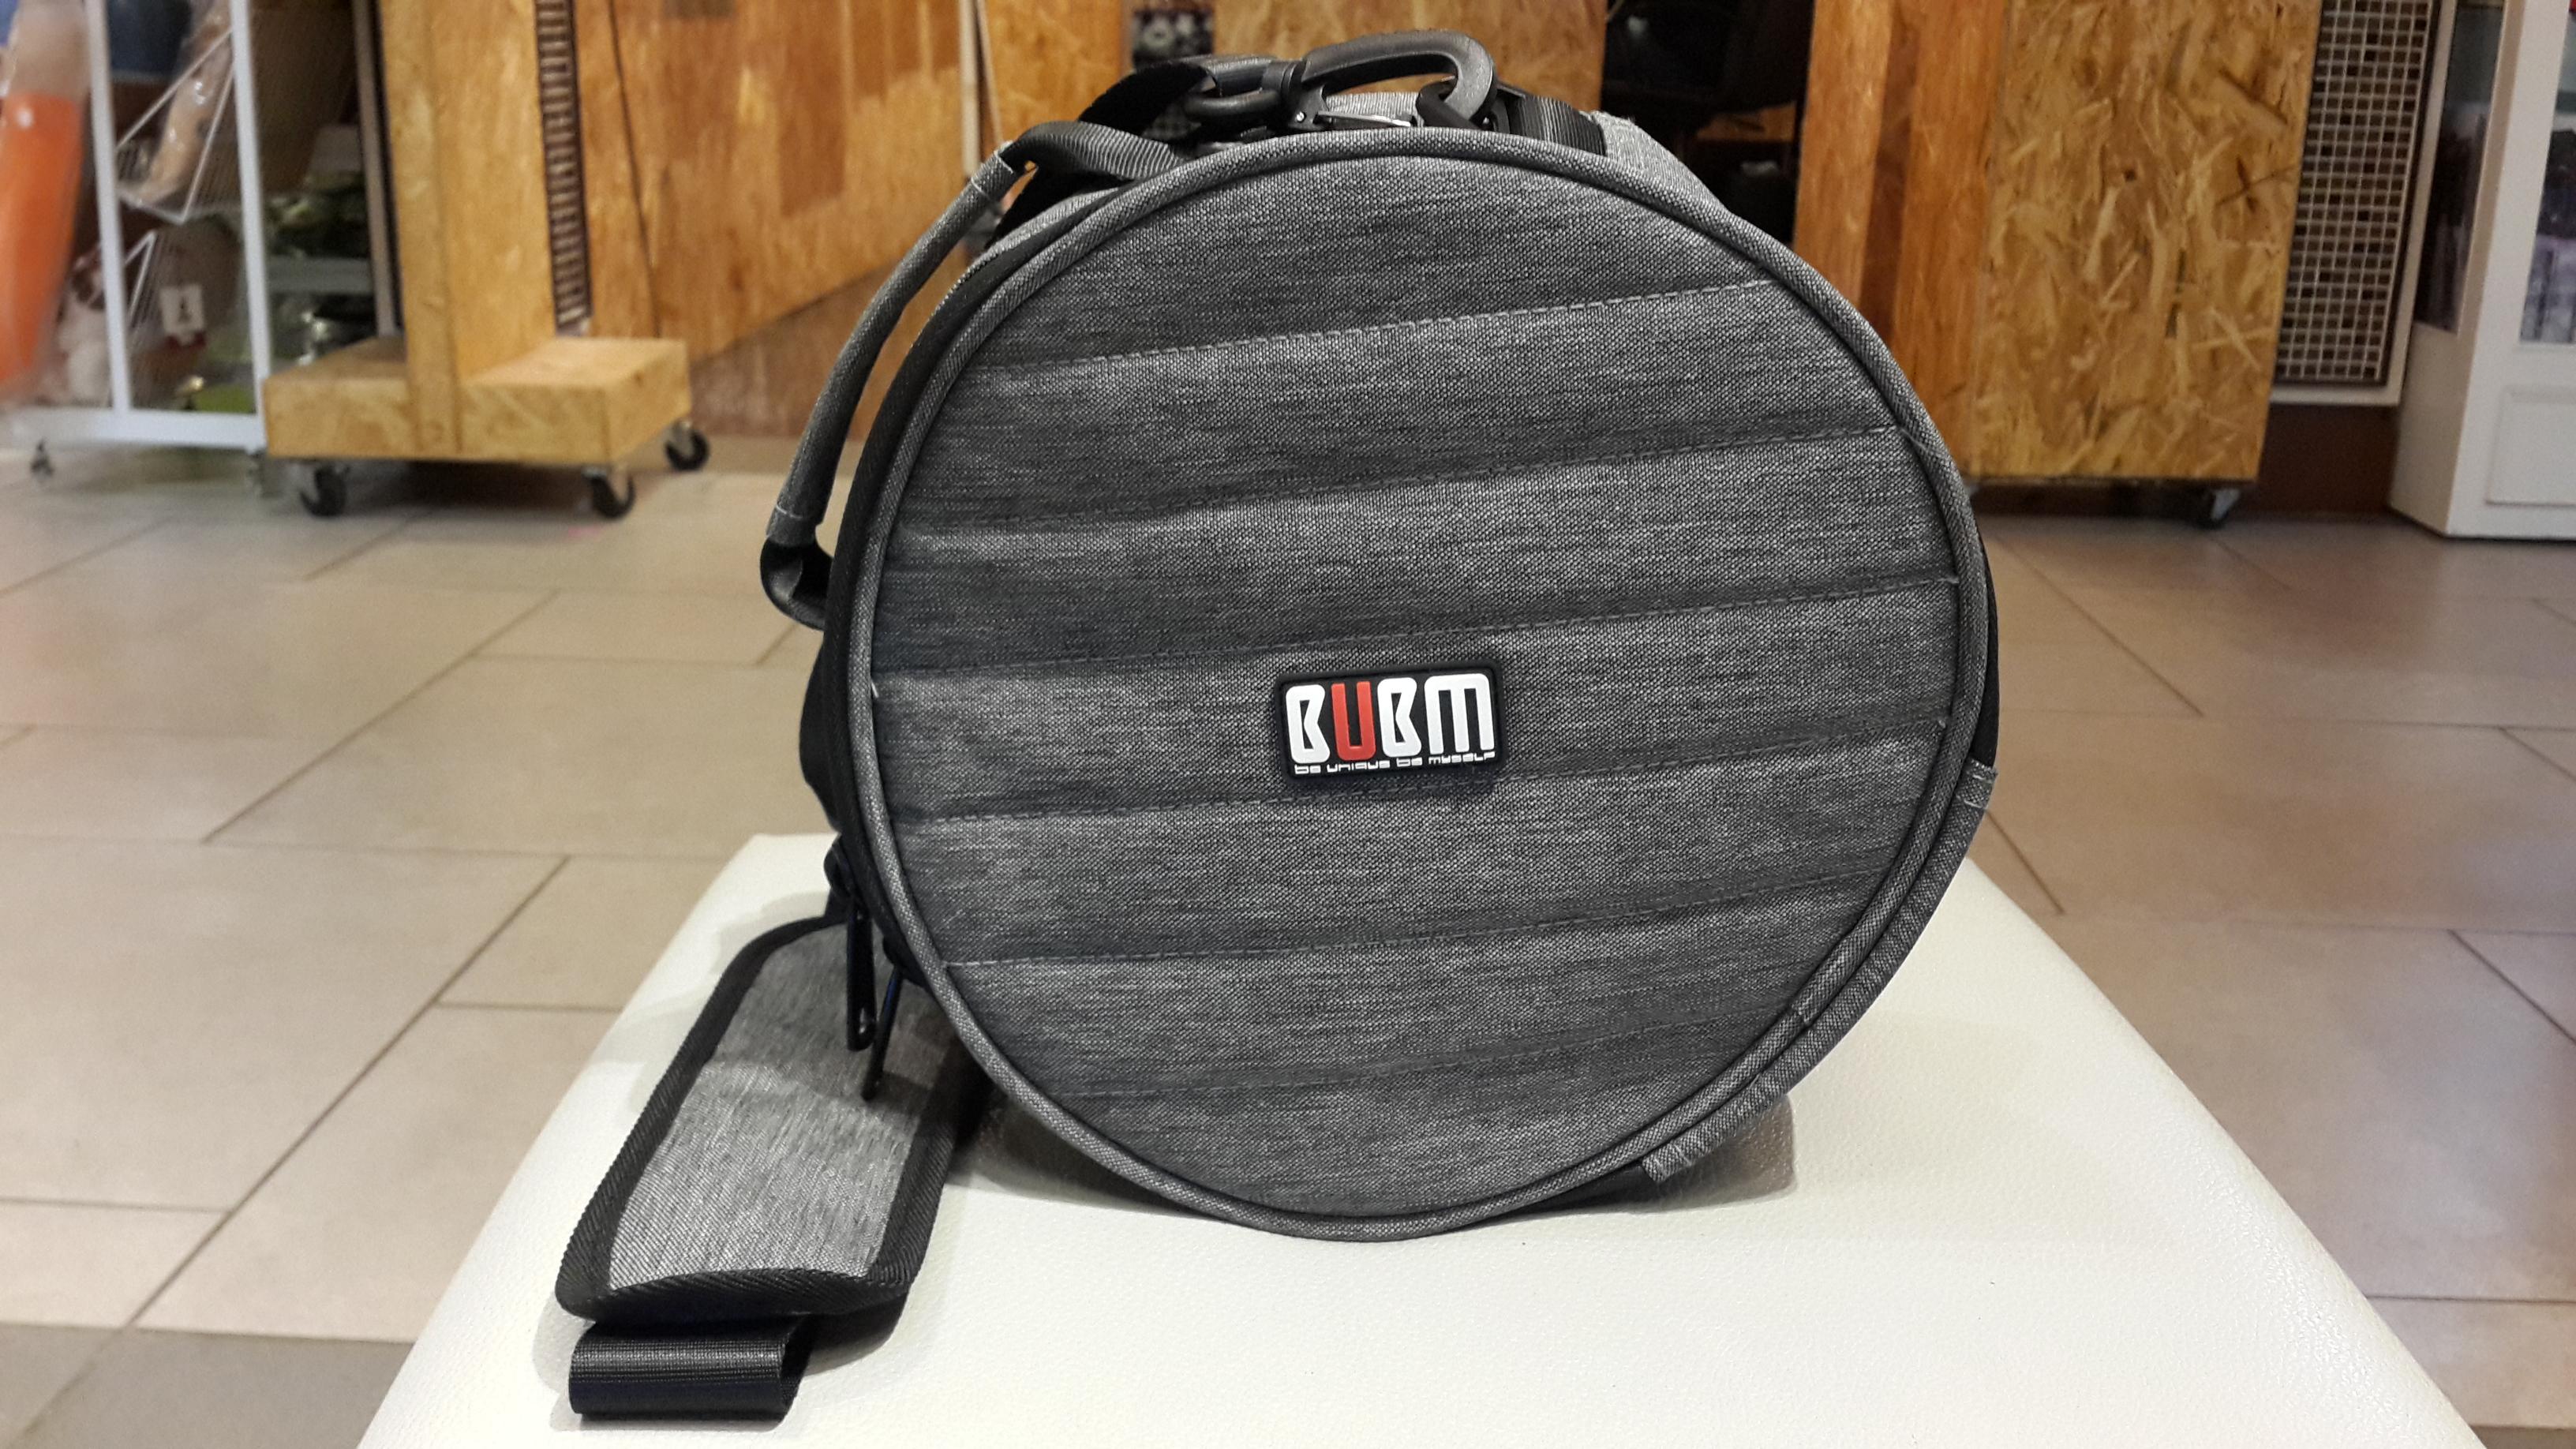 Bubm Hb-L Headphone Bag Dj กระเป๋าหูฟังครอบหูขนาดใหญ่ Fullsize Monitor Headphone Case มีหูหิ้วและสายสะพายข้าง